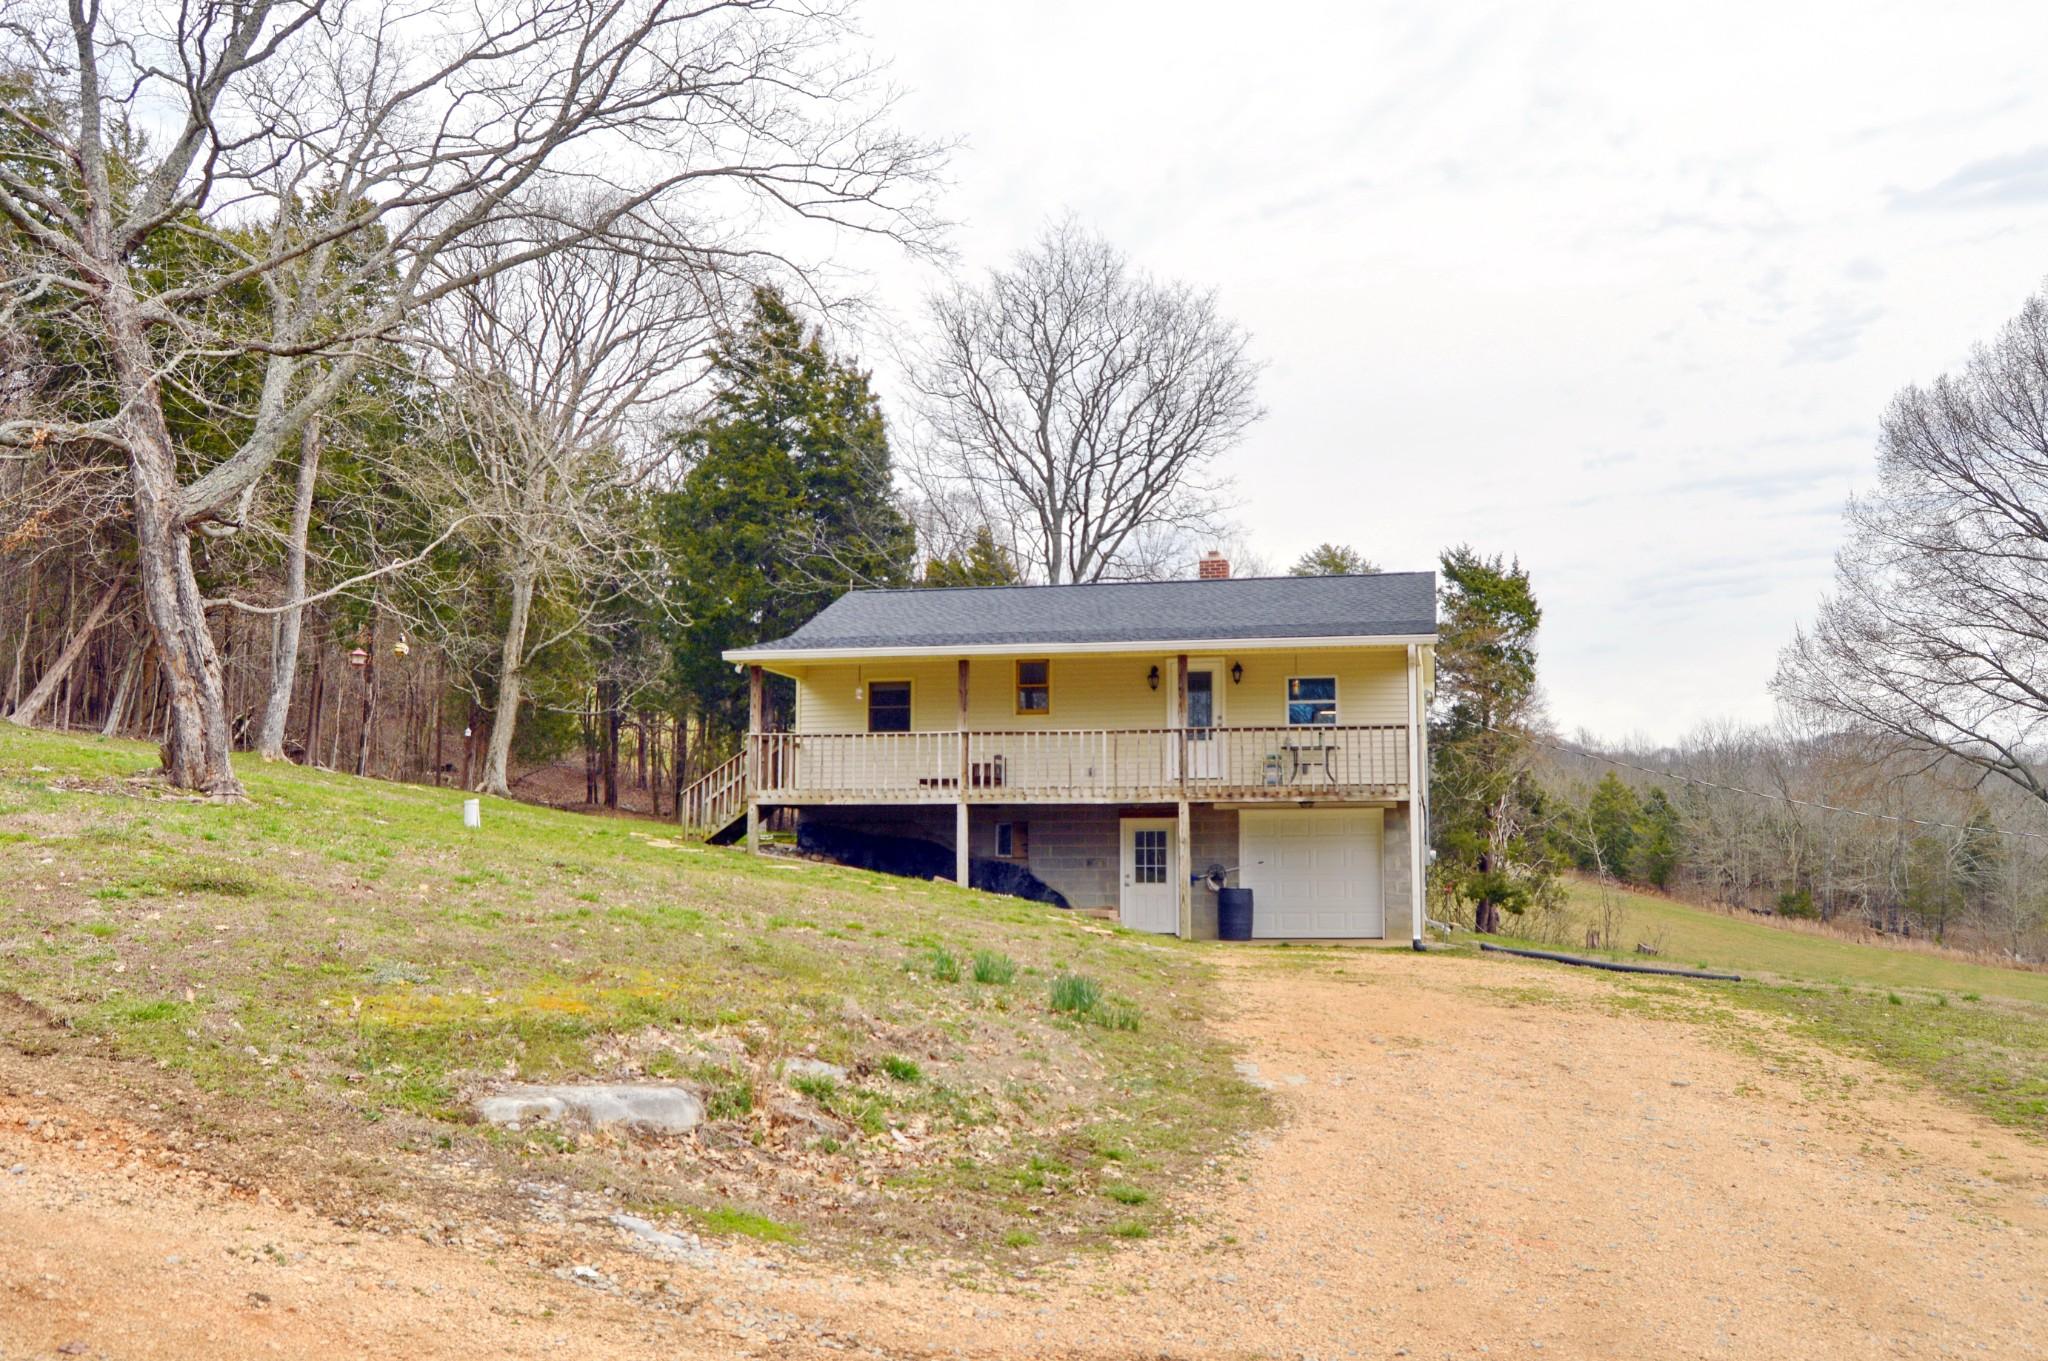 1108 Roberts Rd, Lewisburg, TN 37091 - Lewisburg, TN real estate listing